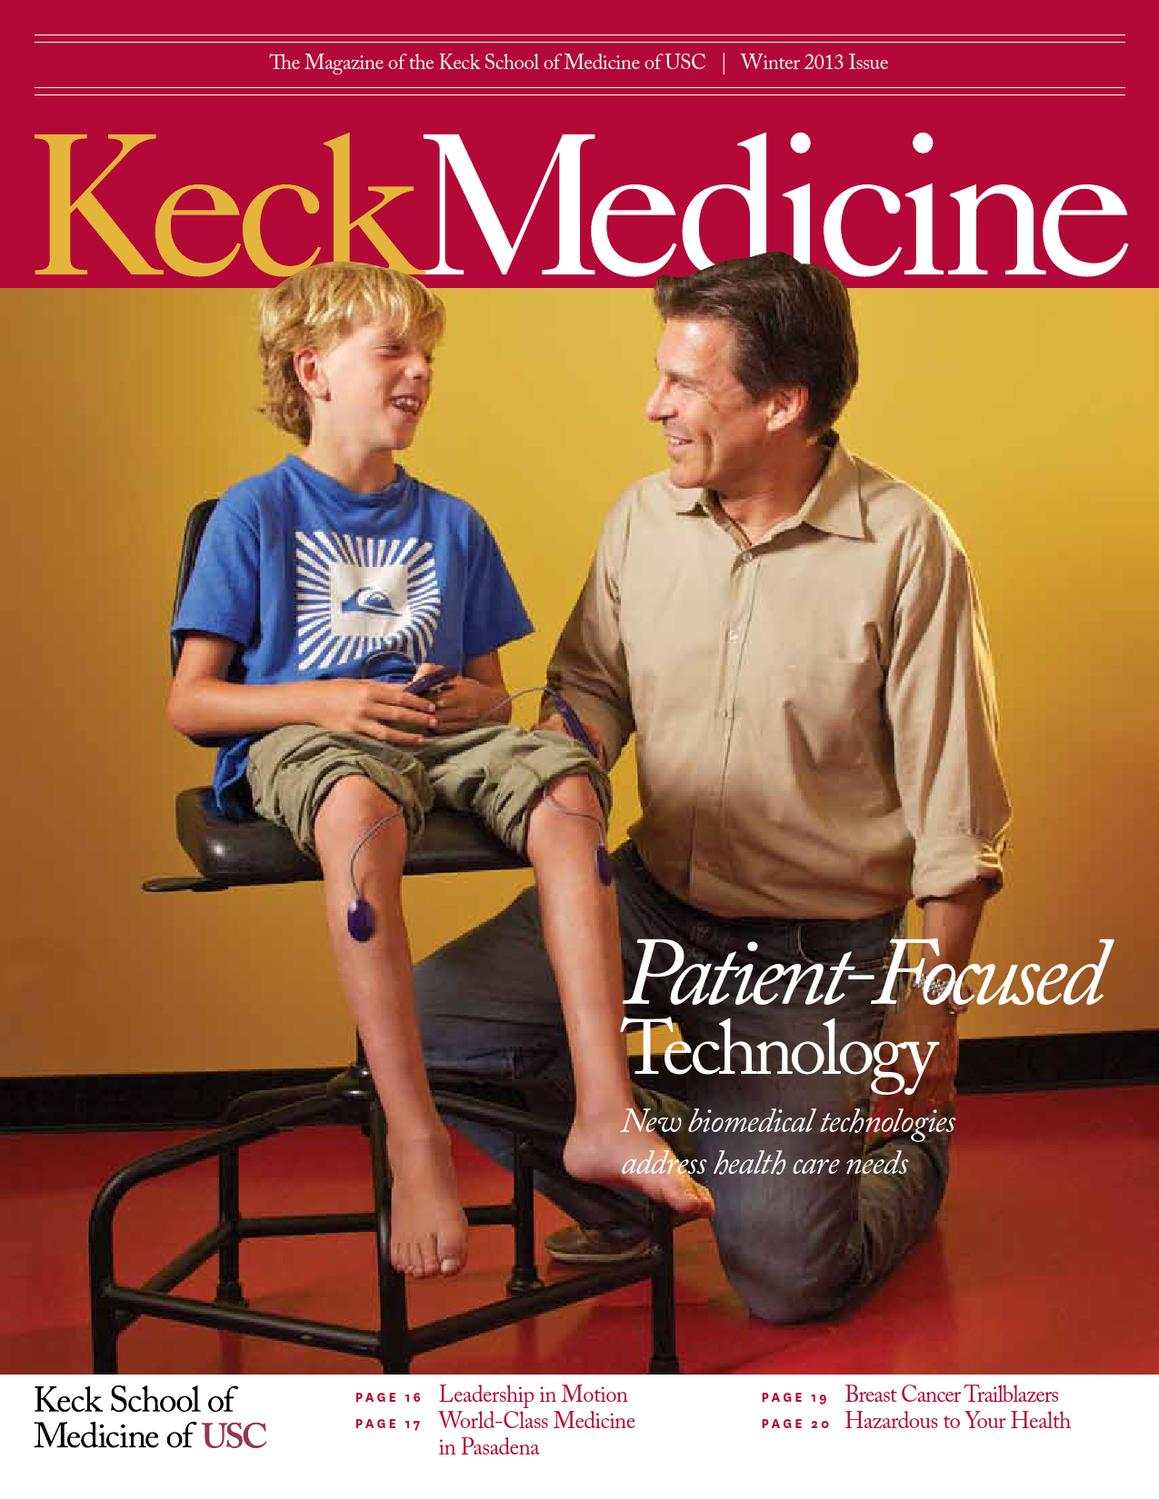 USC Keck Medicine Magazine Winter 2013 by University of